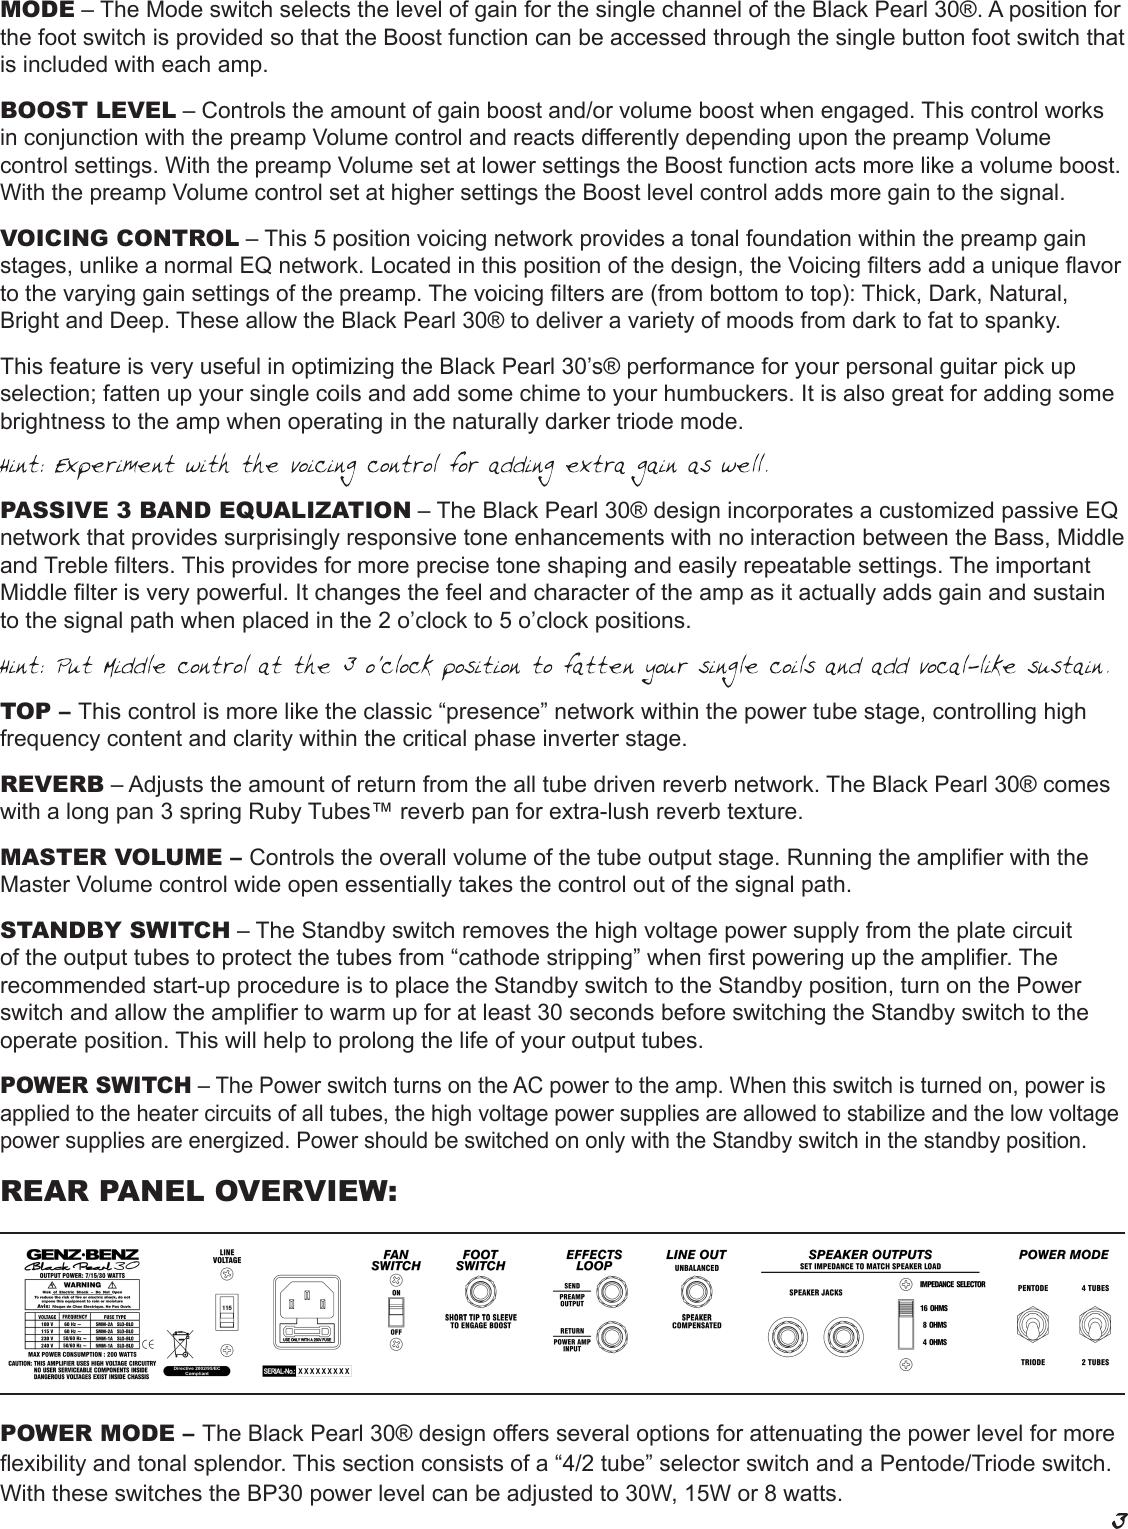 Page 3 of 8 - Genz-Benz Genz-Benz-Black-Pearl-30-Bp30-Users-Manual-  Genz-benz-black-pearl-30-bp30-users-manual